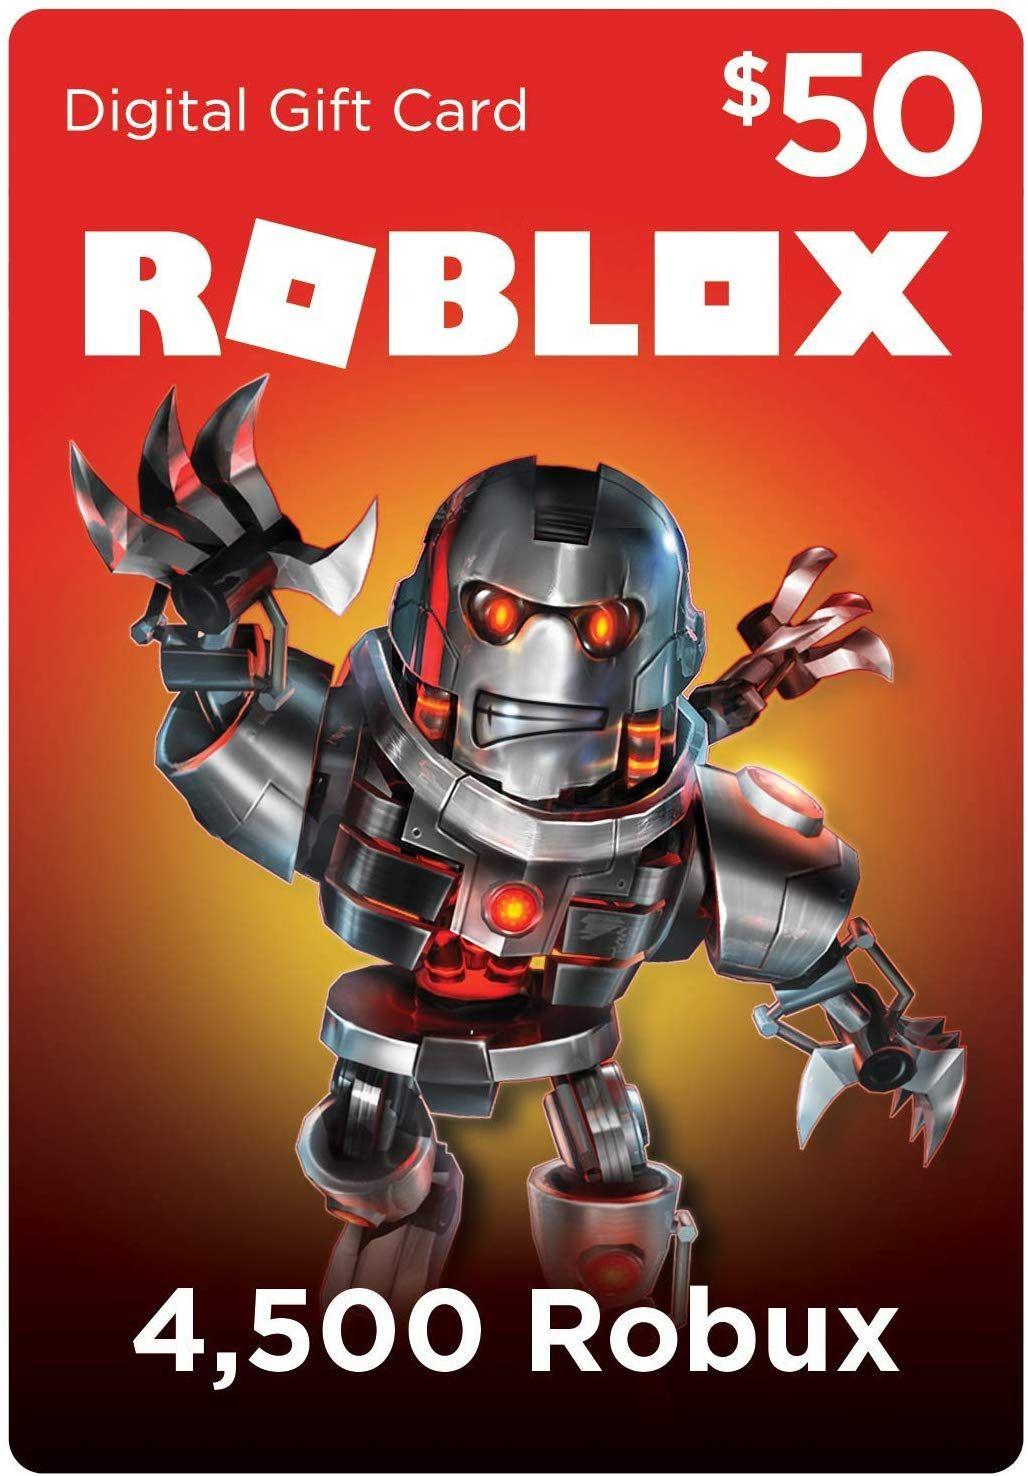 Roblox Gift Card 4500 Robux [Digital Code]